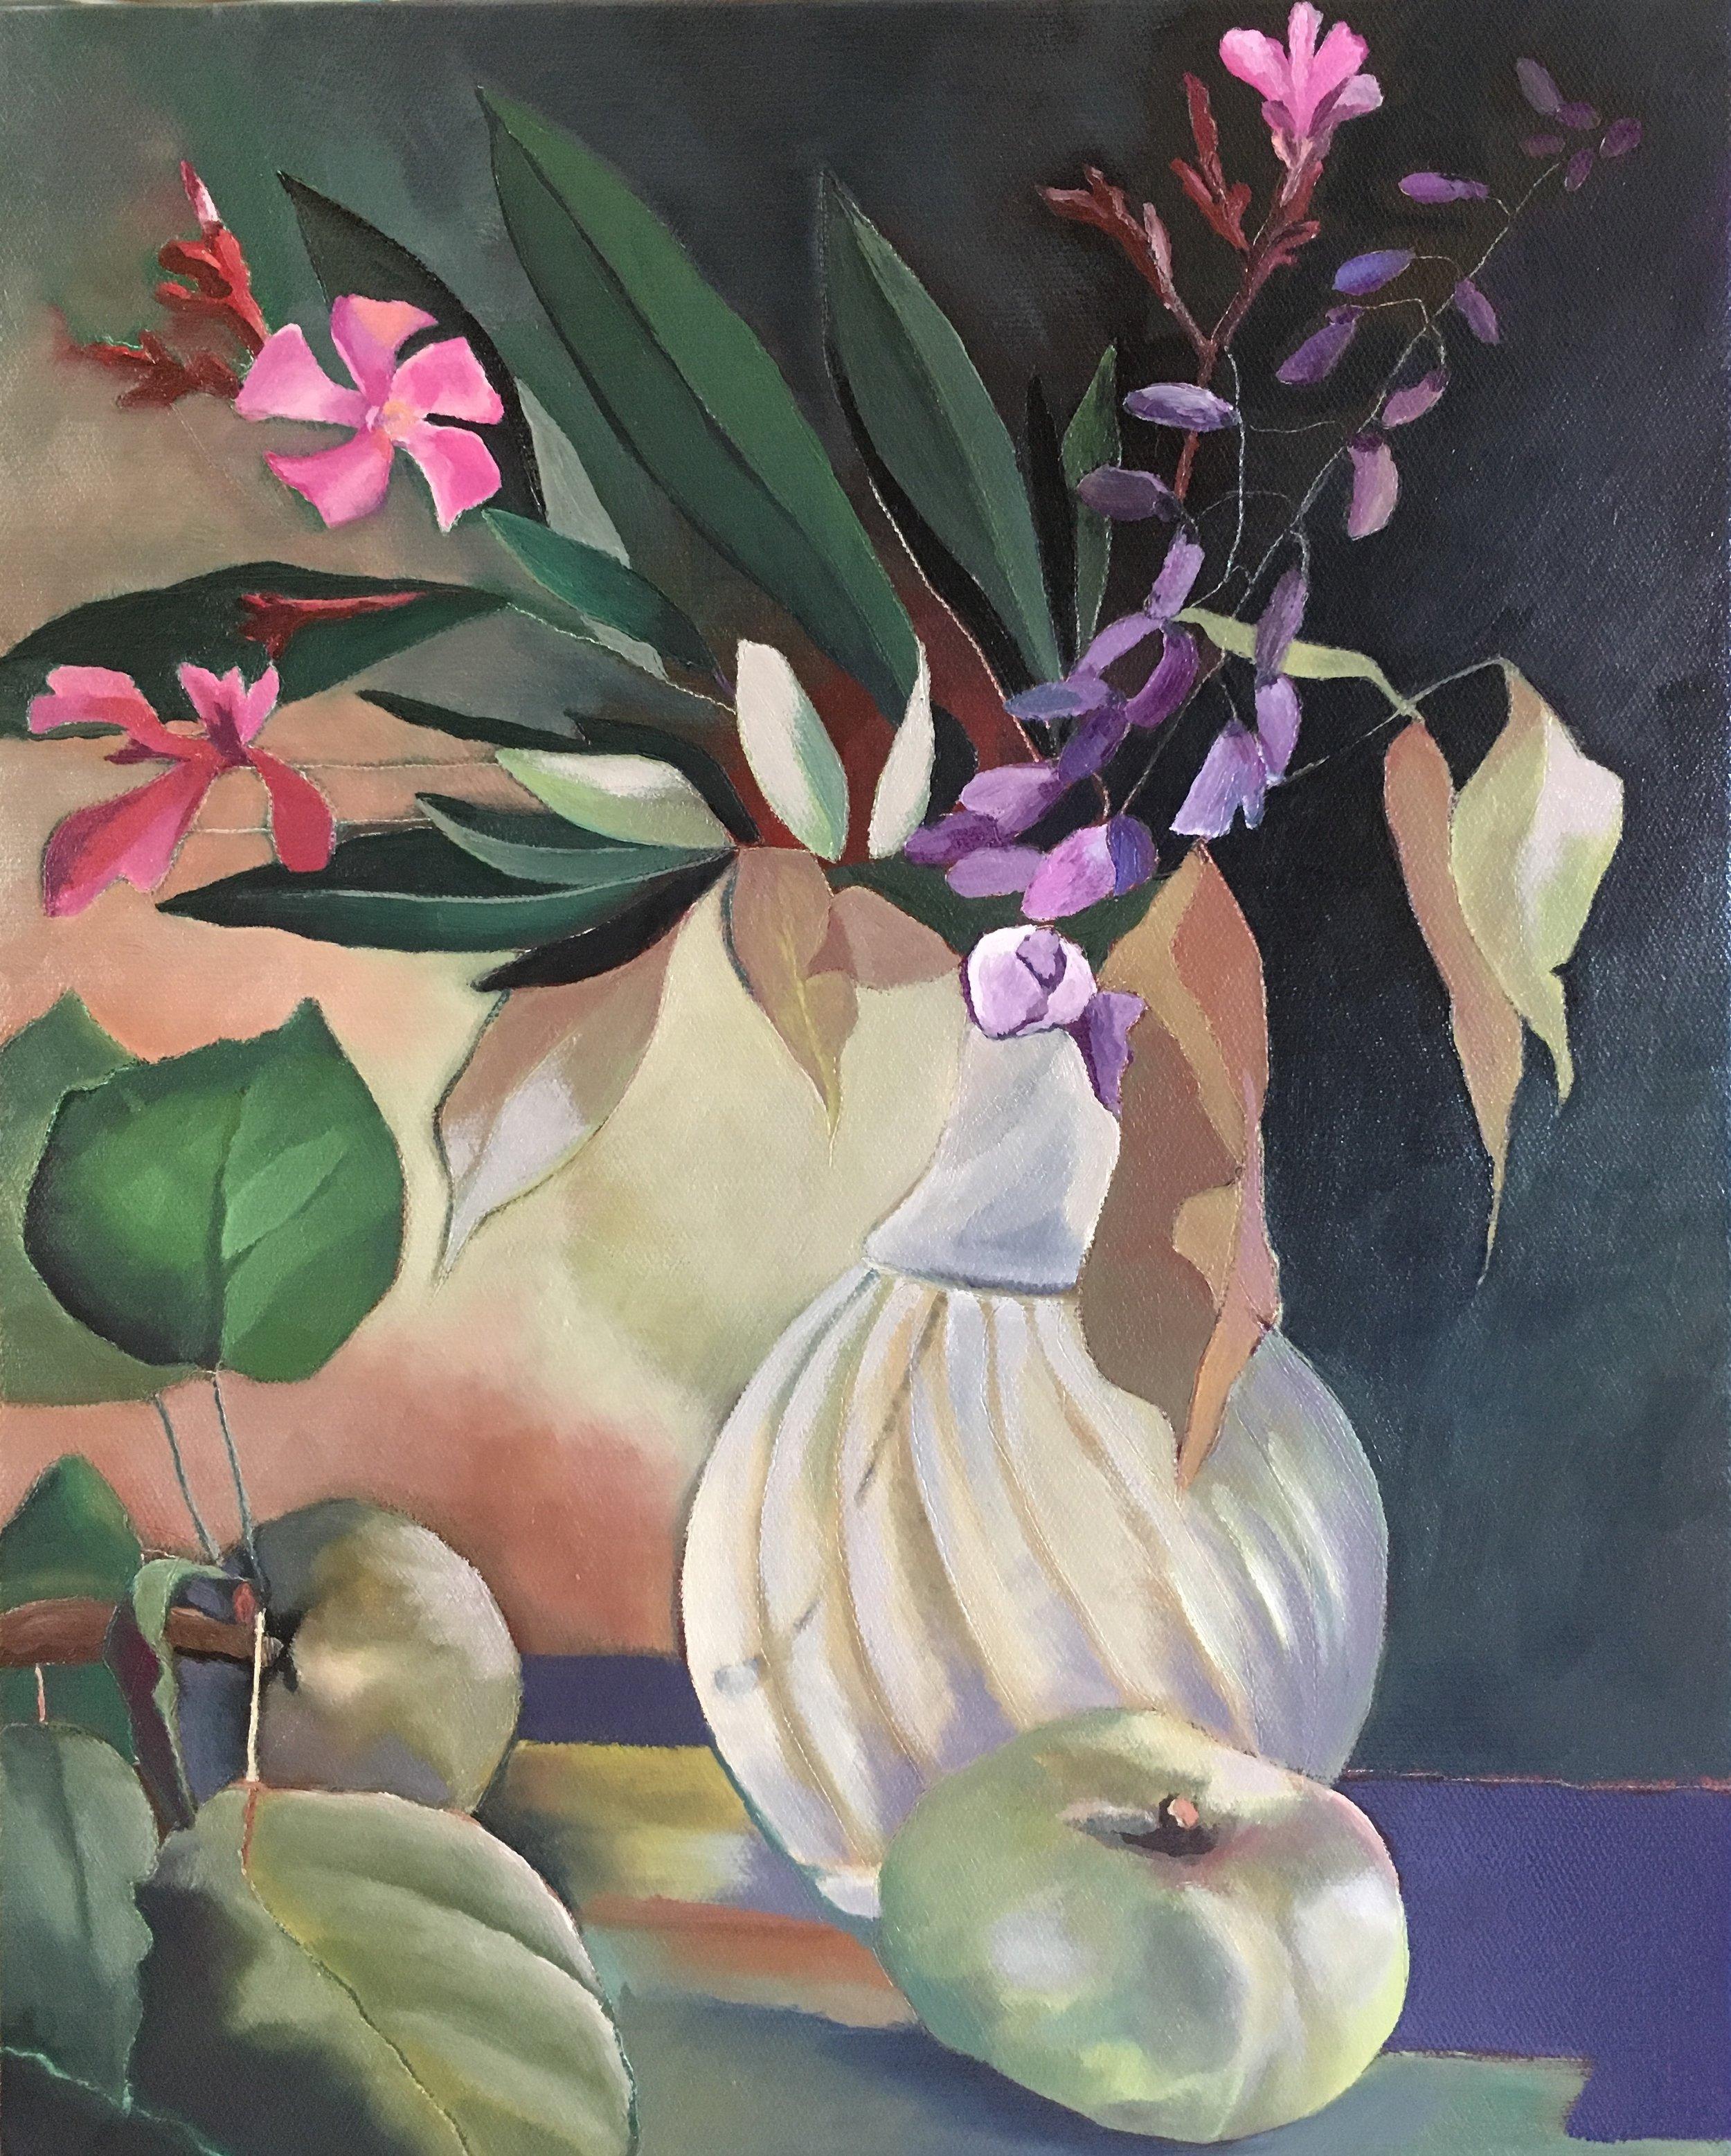 Oil on canvas 33 x 41cm, 2018